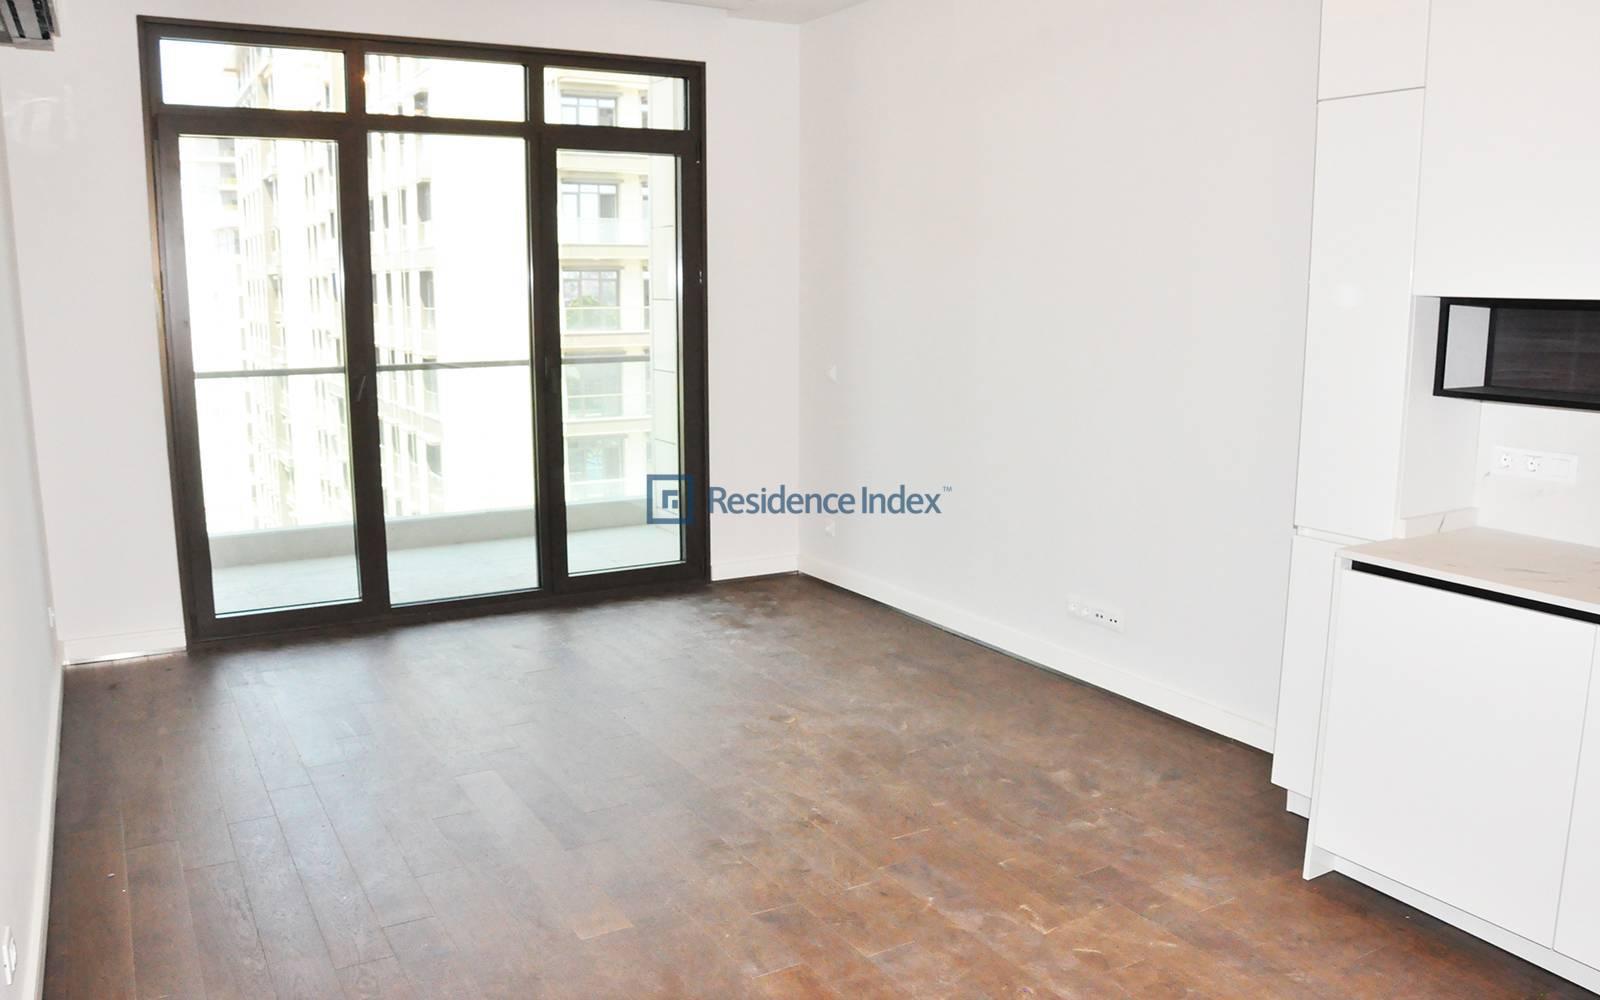 Piyalepaşa İstanbul - 1 + 1 apartment for rent